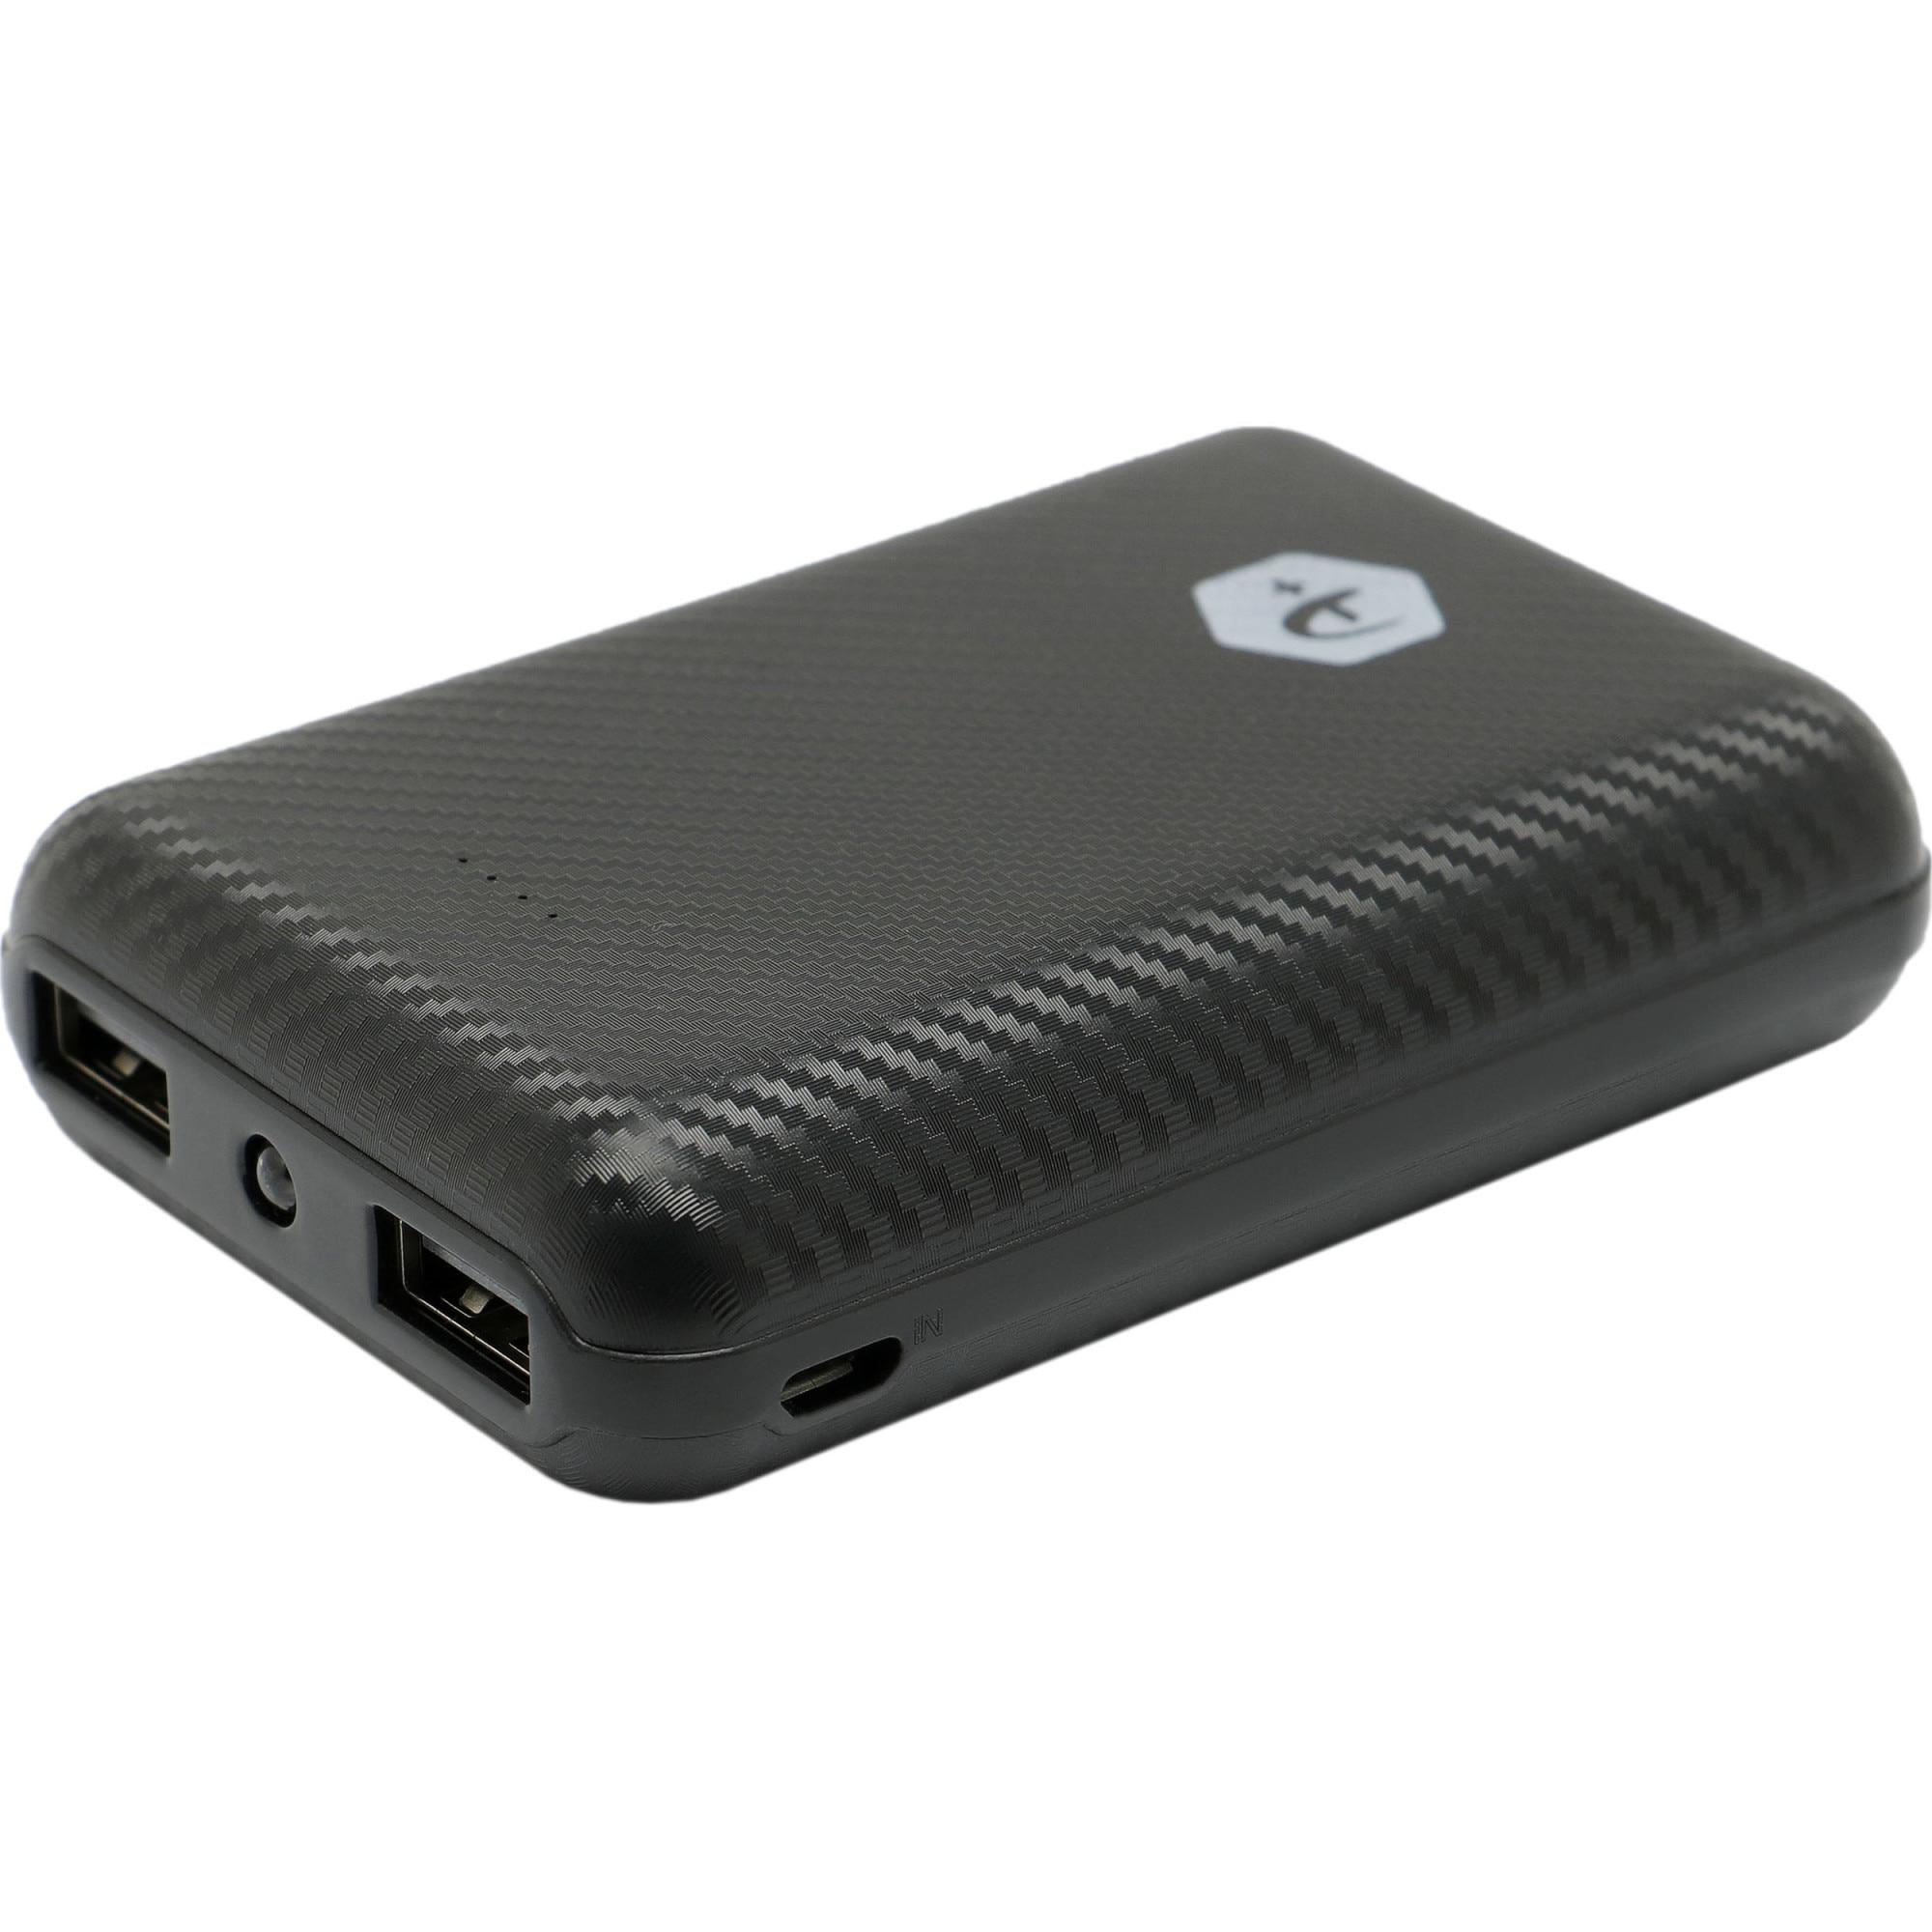 Fotografie Acumulator extern A+, 10.000 mAh, 2 porturi USB, conectivitate micro USB